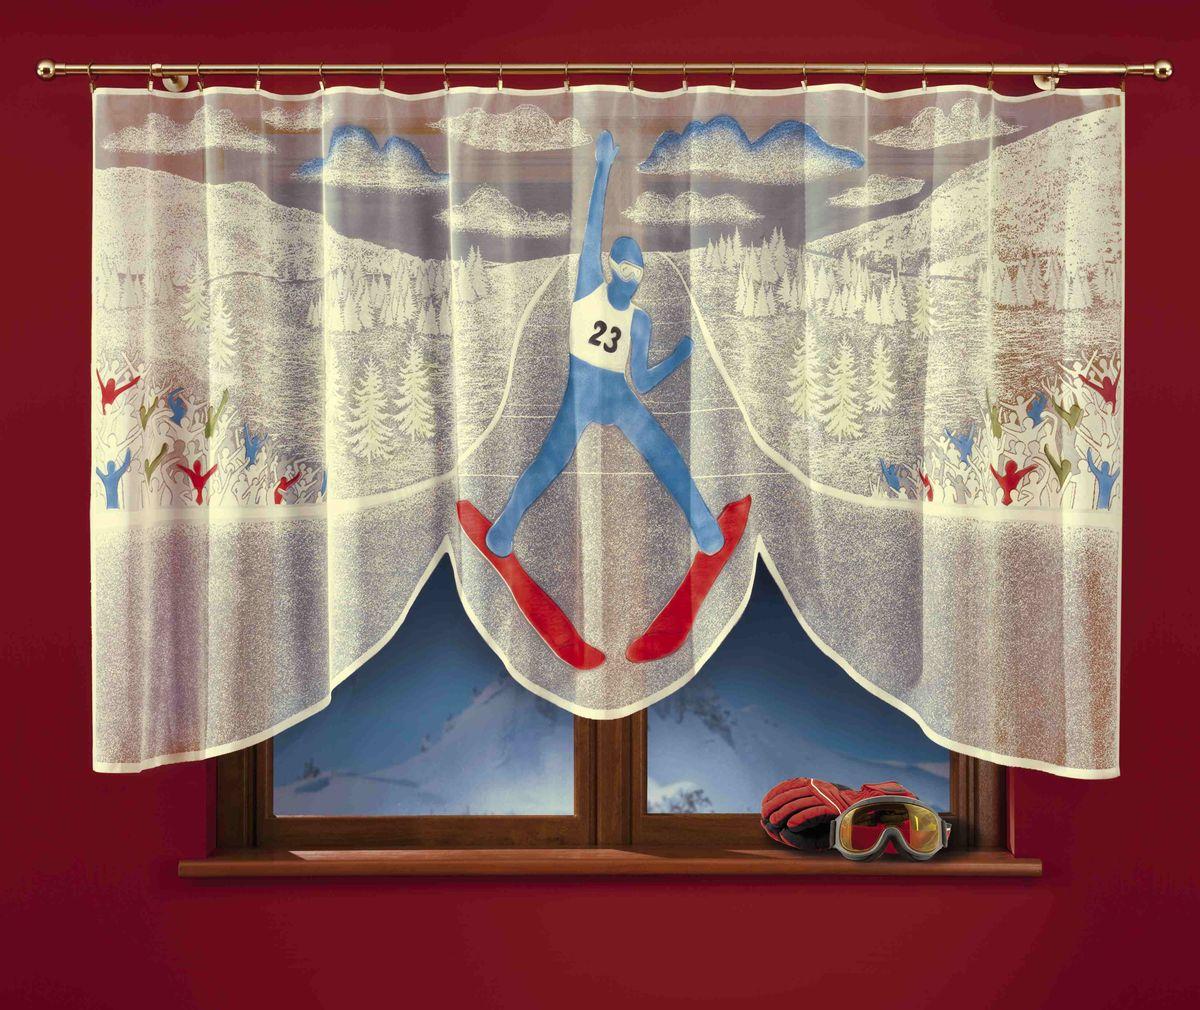 Гардина Wisan Skoczek, цвет: молочный, высота 150 см гардина wisan 040w